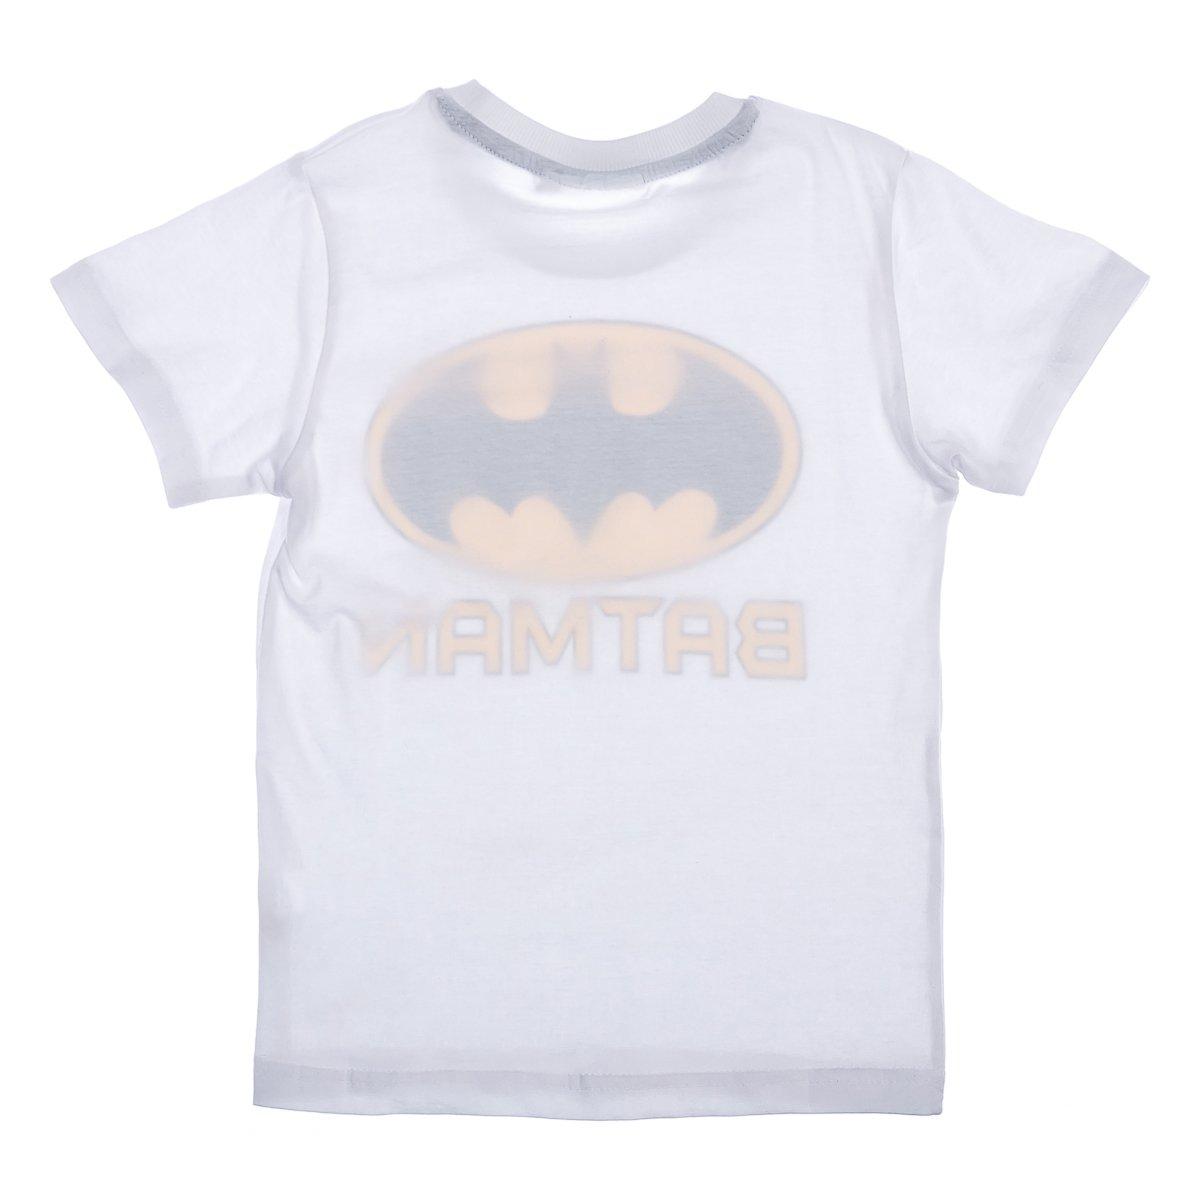 Купить Футболки, майки, топы, туники, Футболка E Plus M Batman White, р. 134 BAT5202184 ТМ: E Plus M, белый